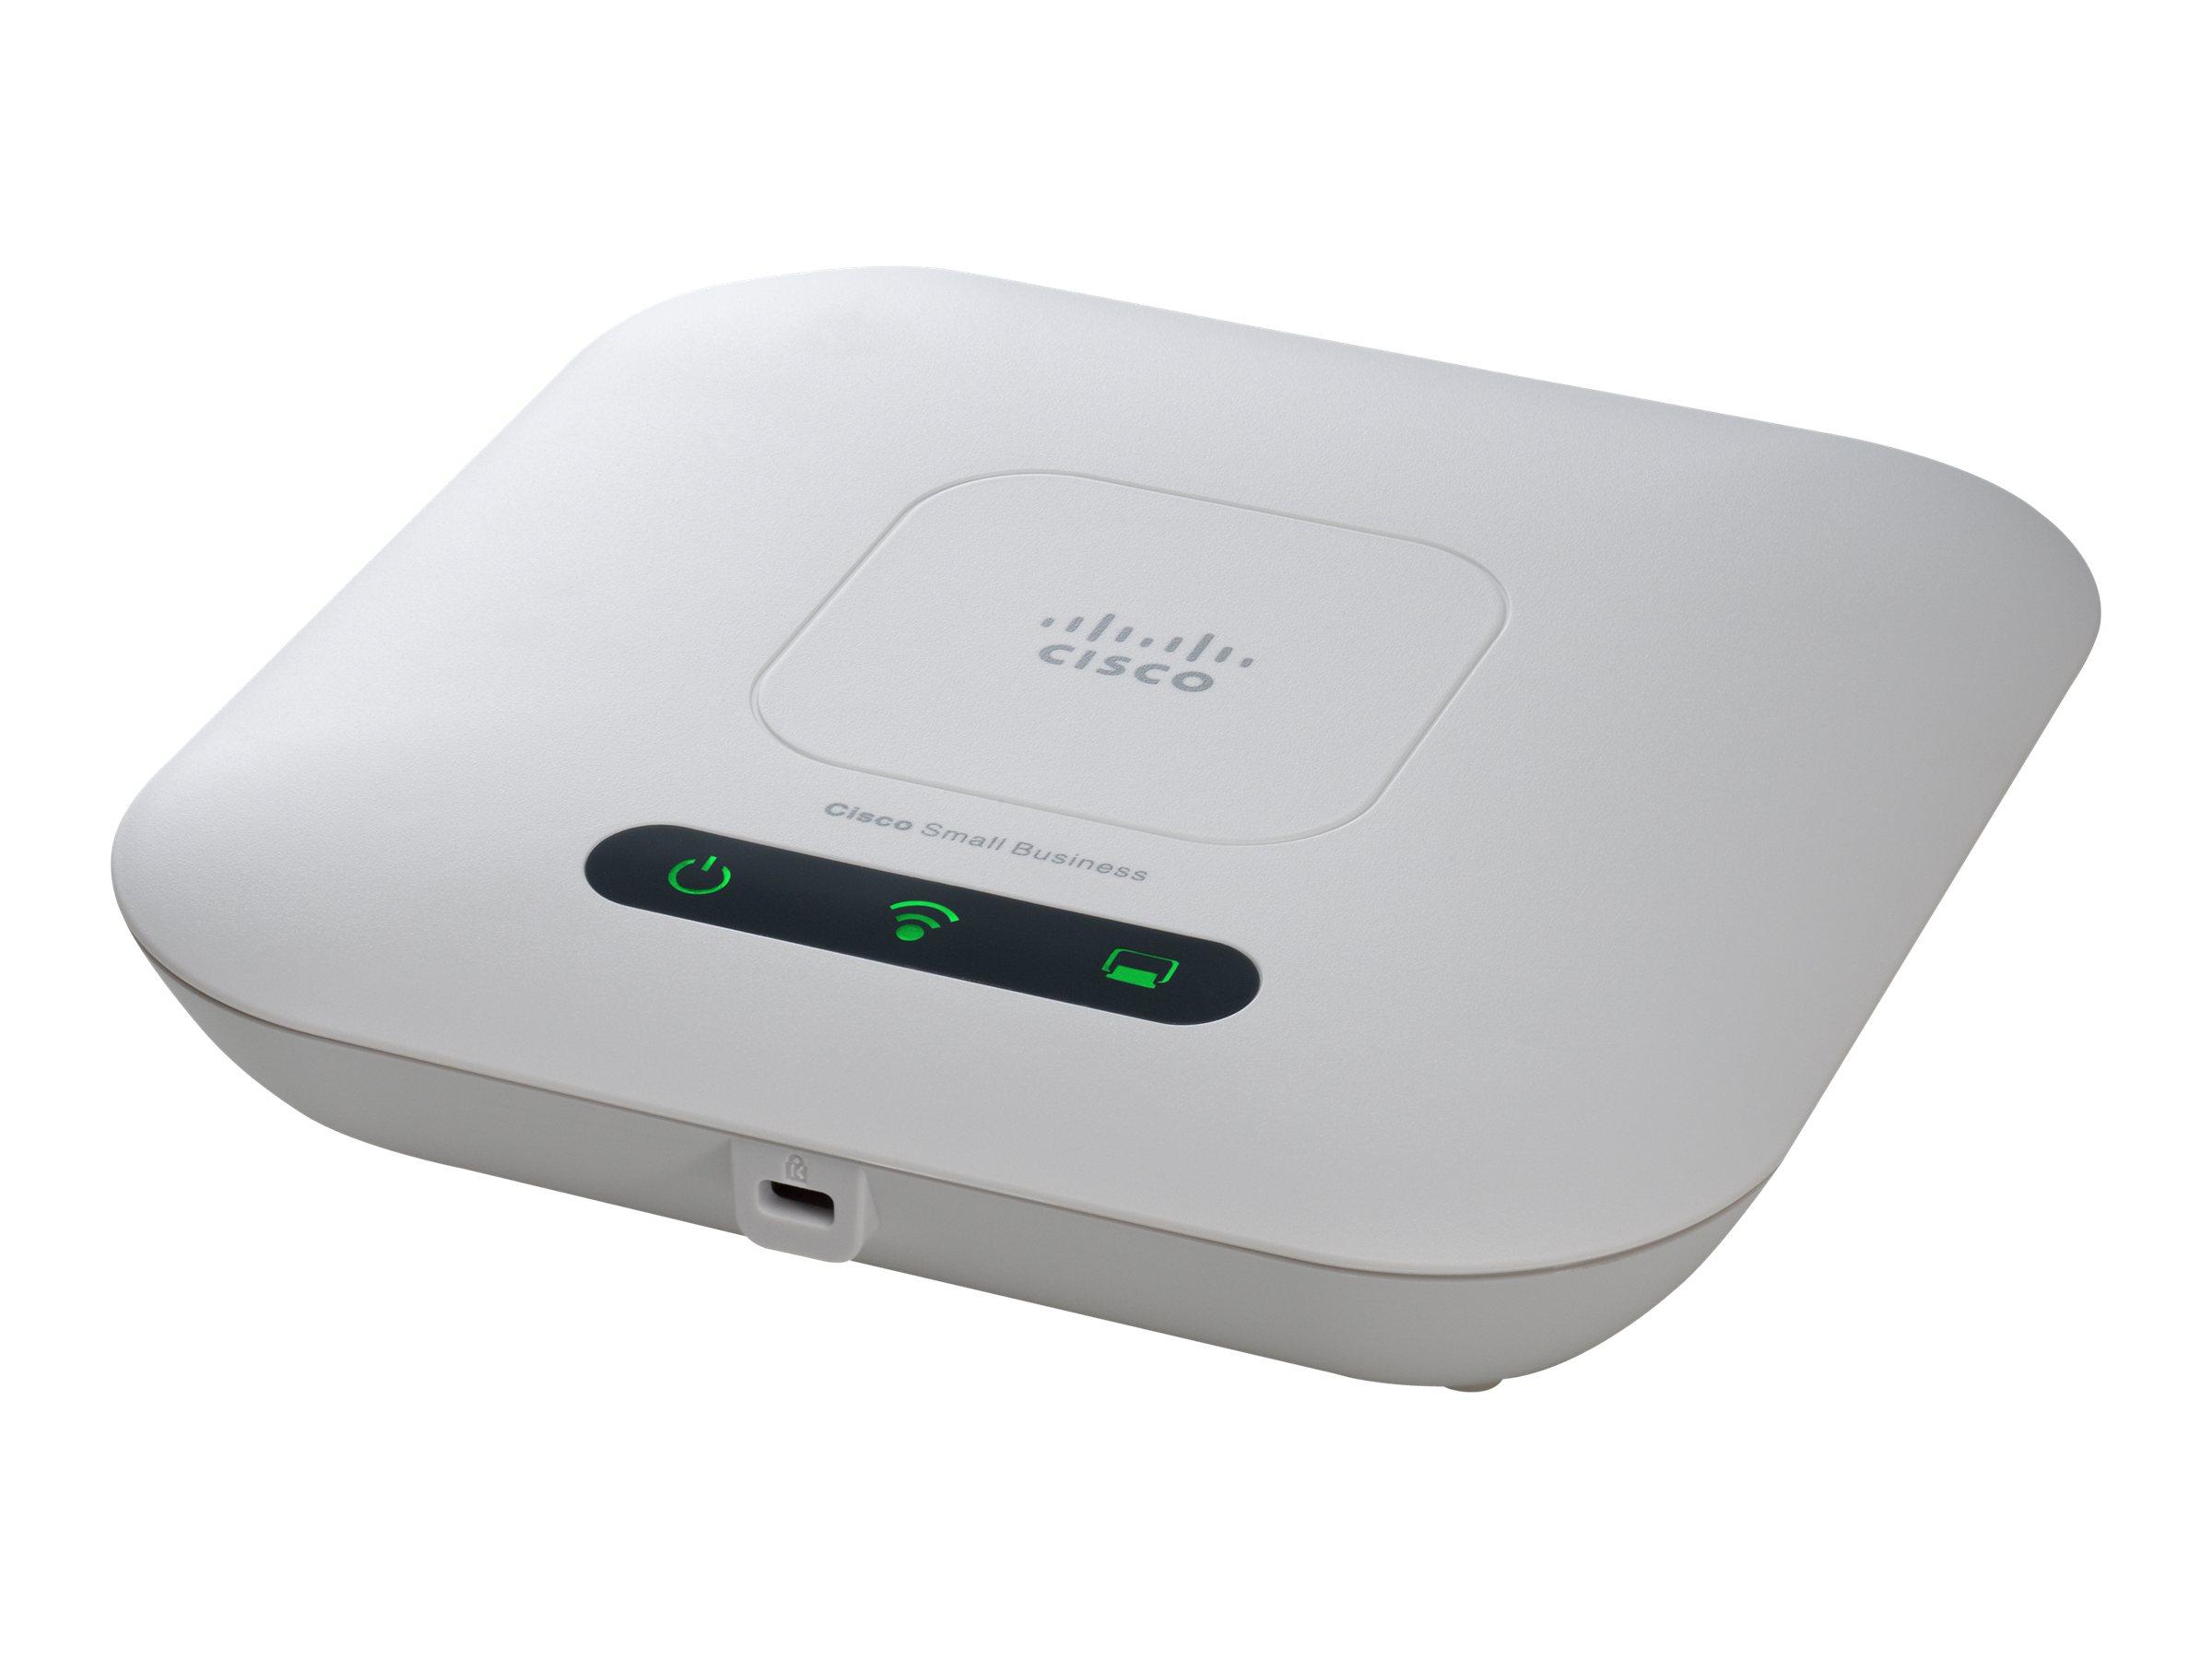 Cisco Small Business WAP321 - Drahtlose Basisstation